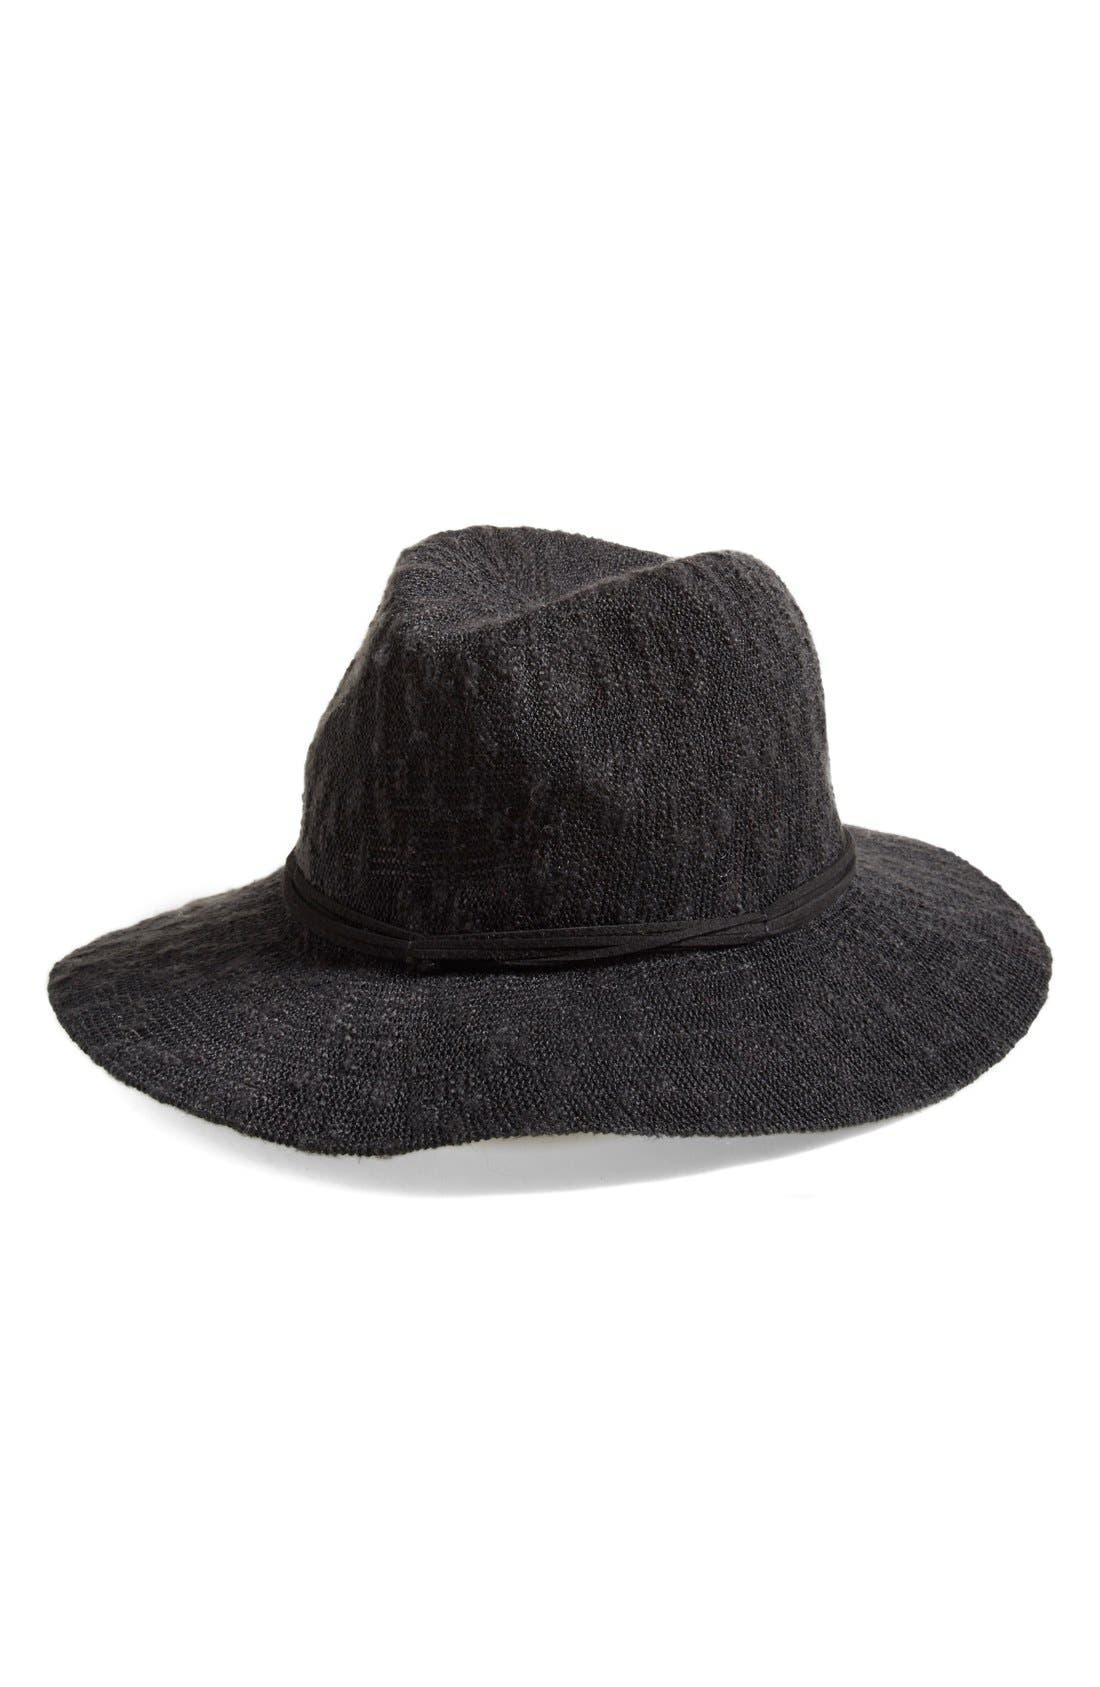 Slub Knit Panama Hat,                         Main,                         color, Black